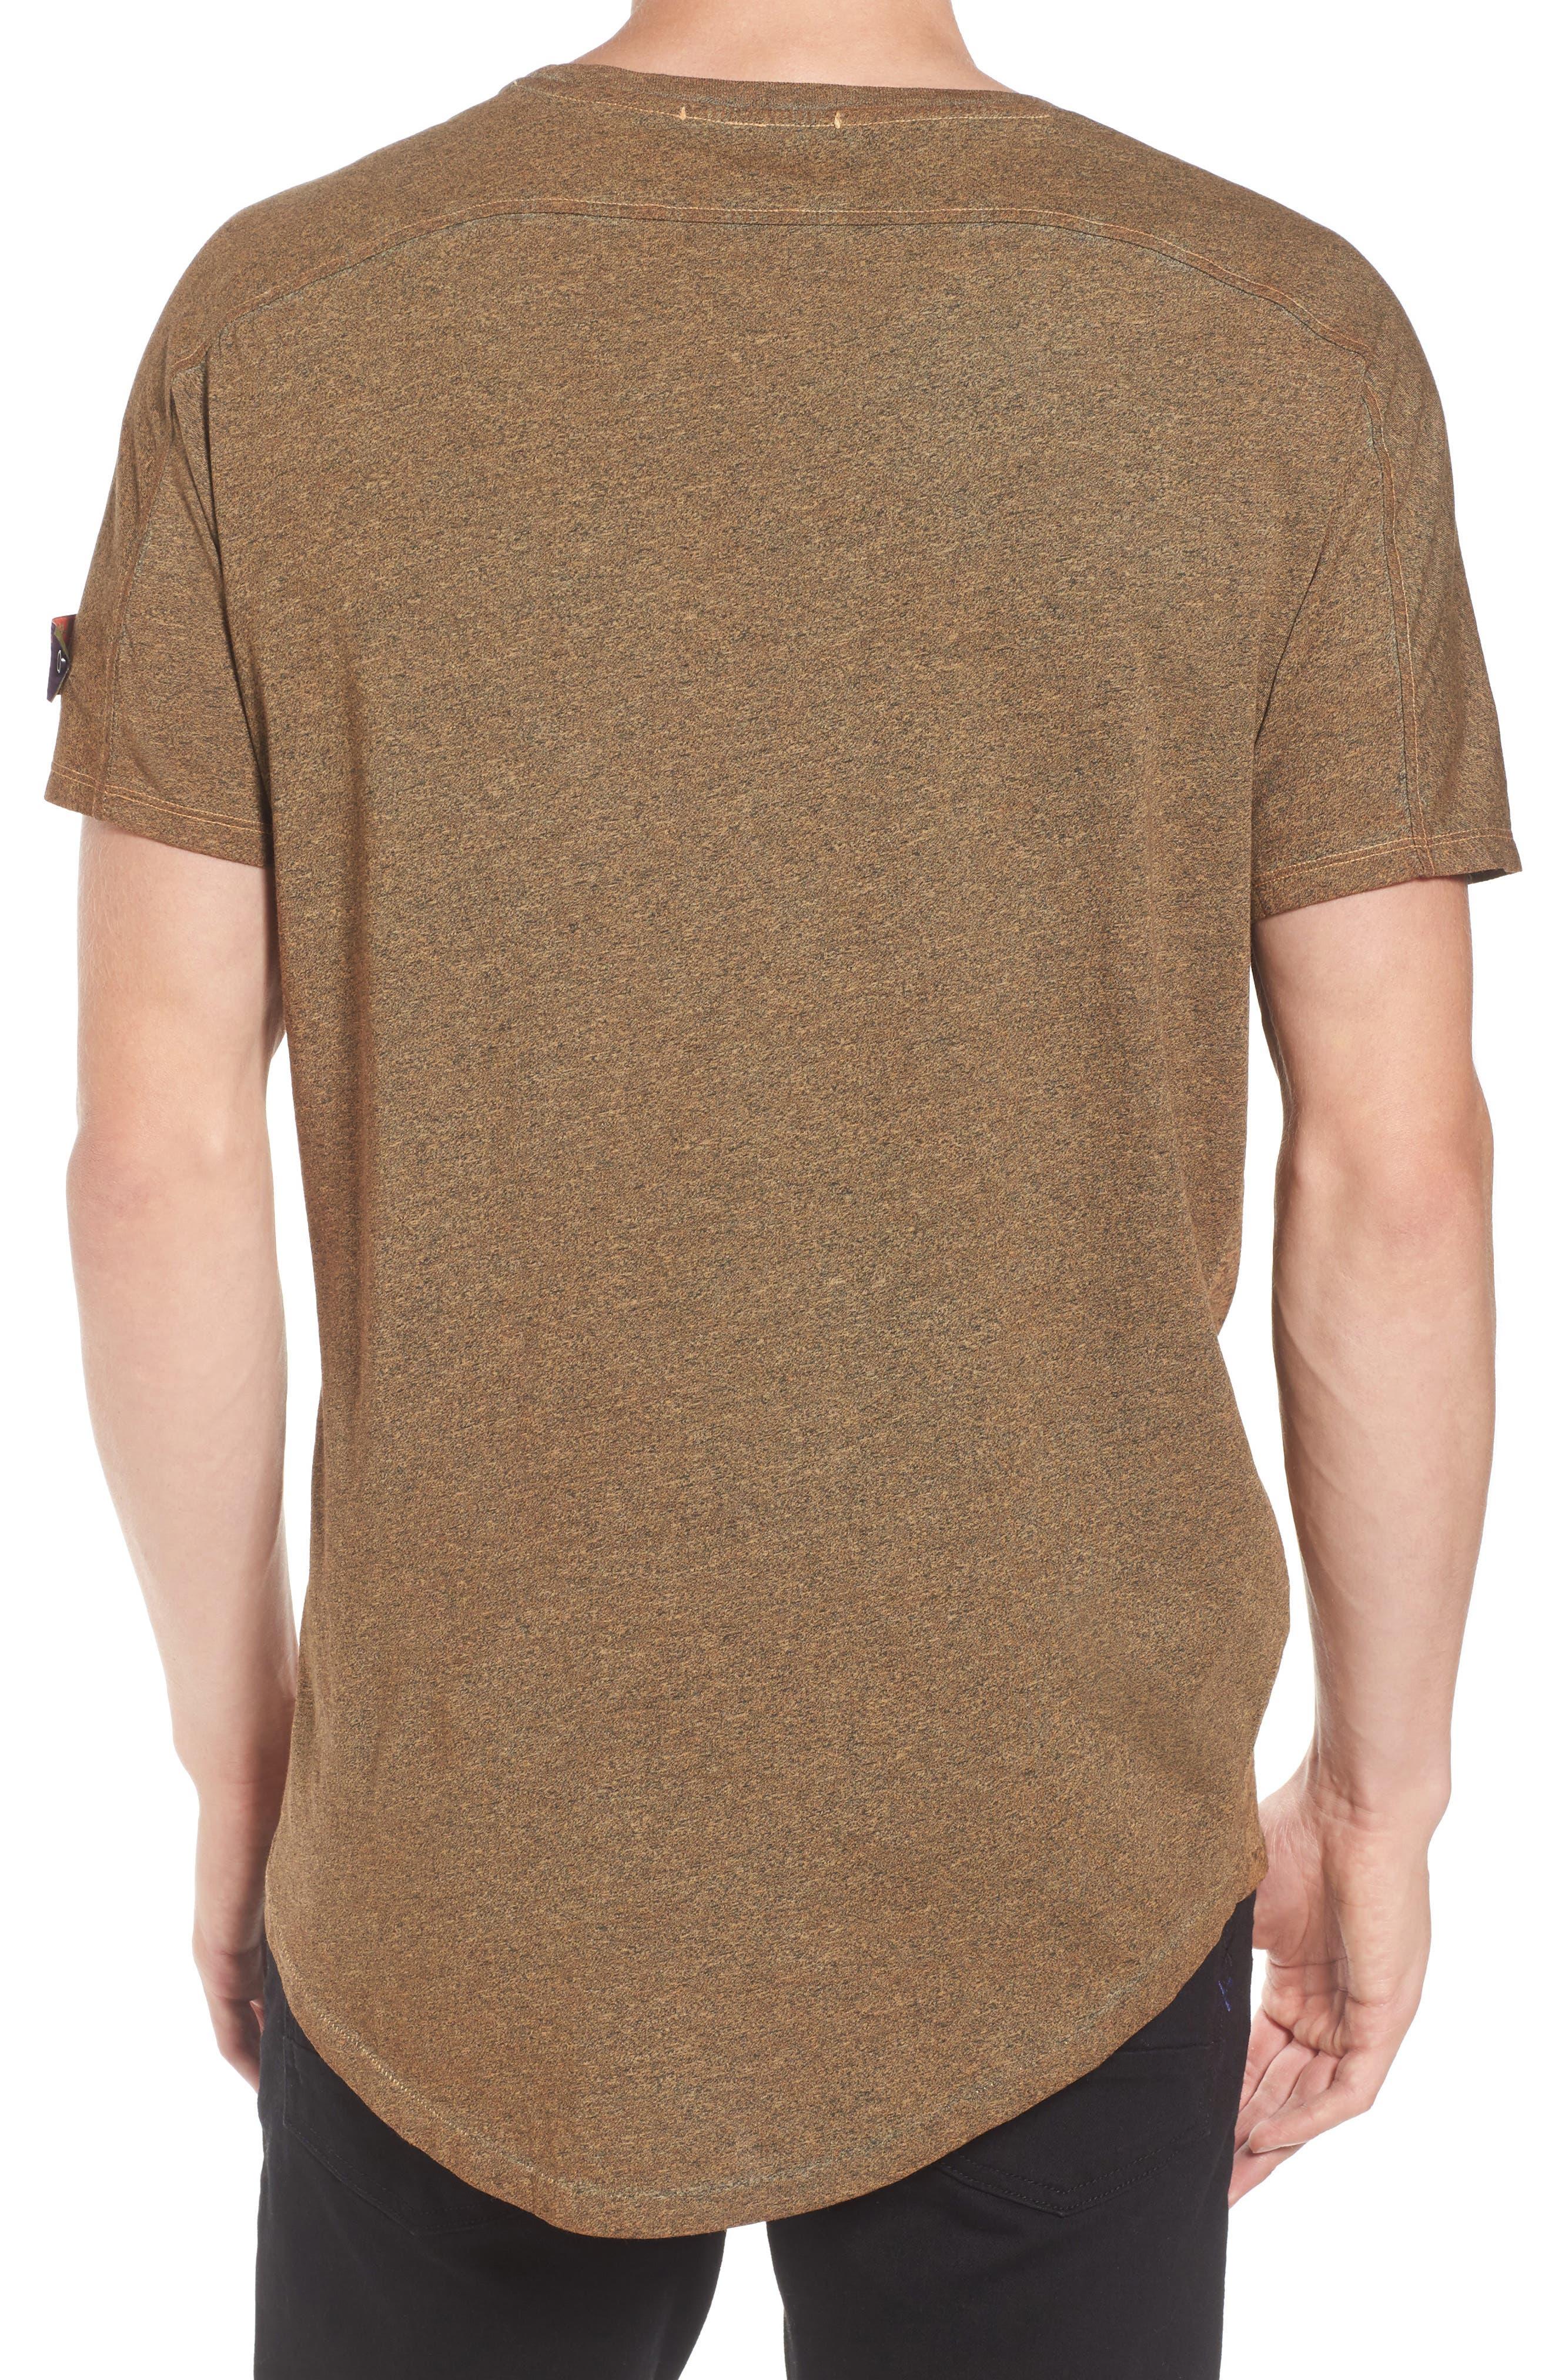 Oil-Washed Pocket T-Shirt,                             Alternate thumbnail 4, color,